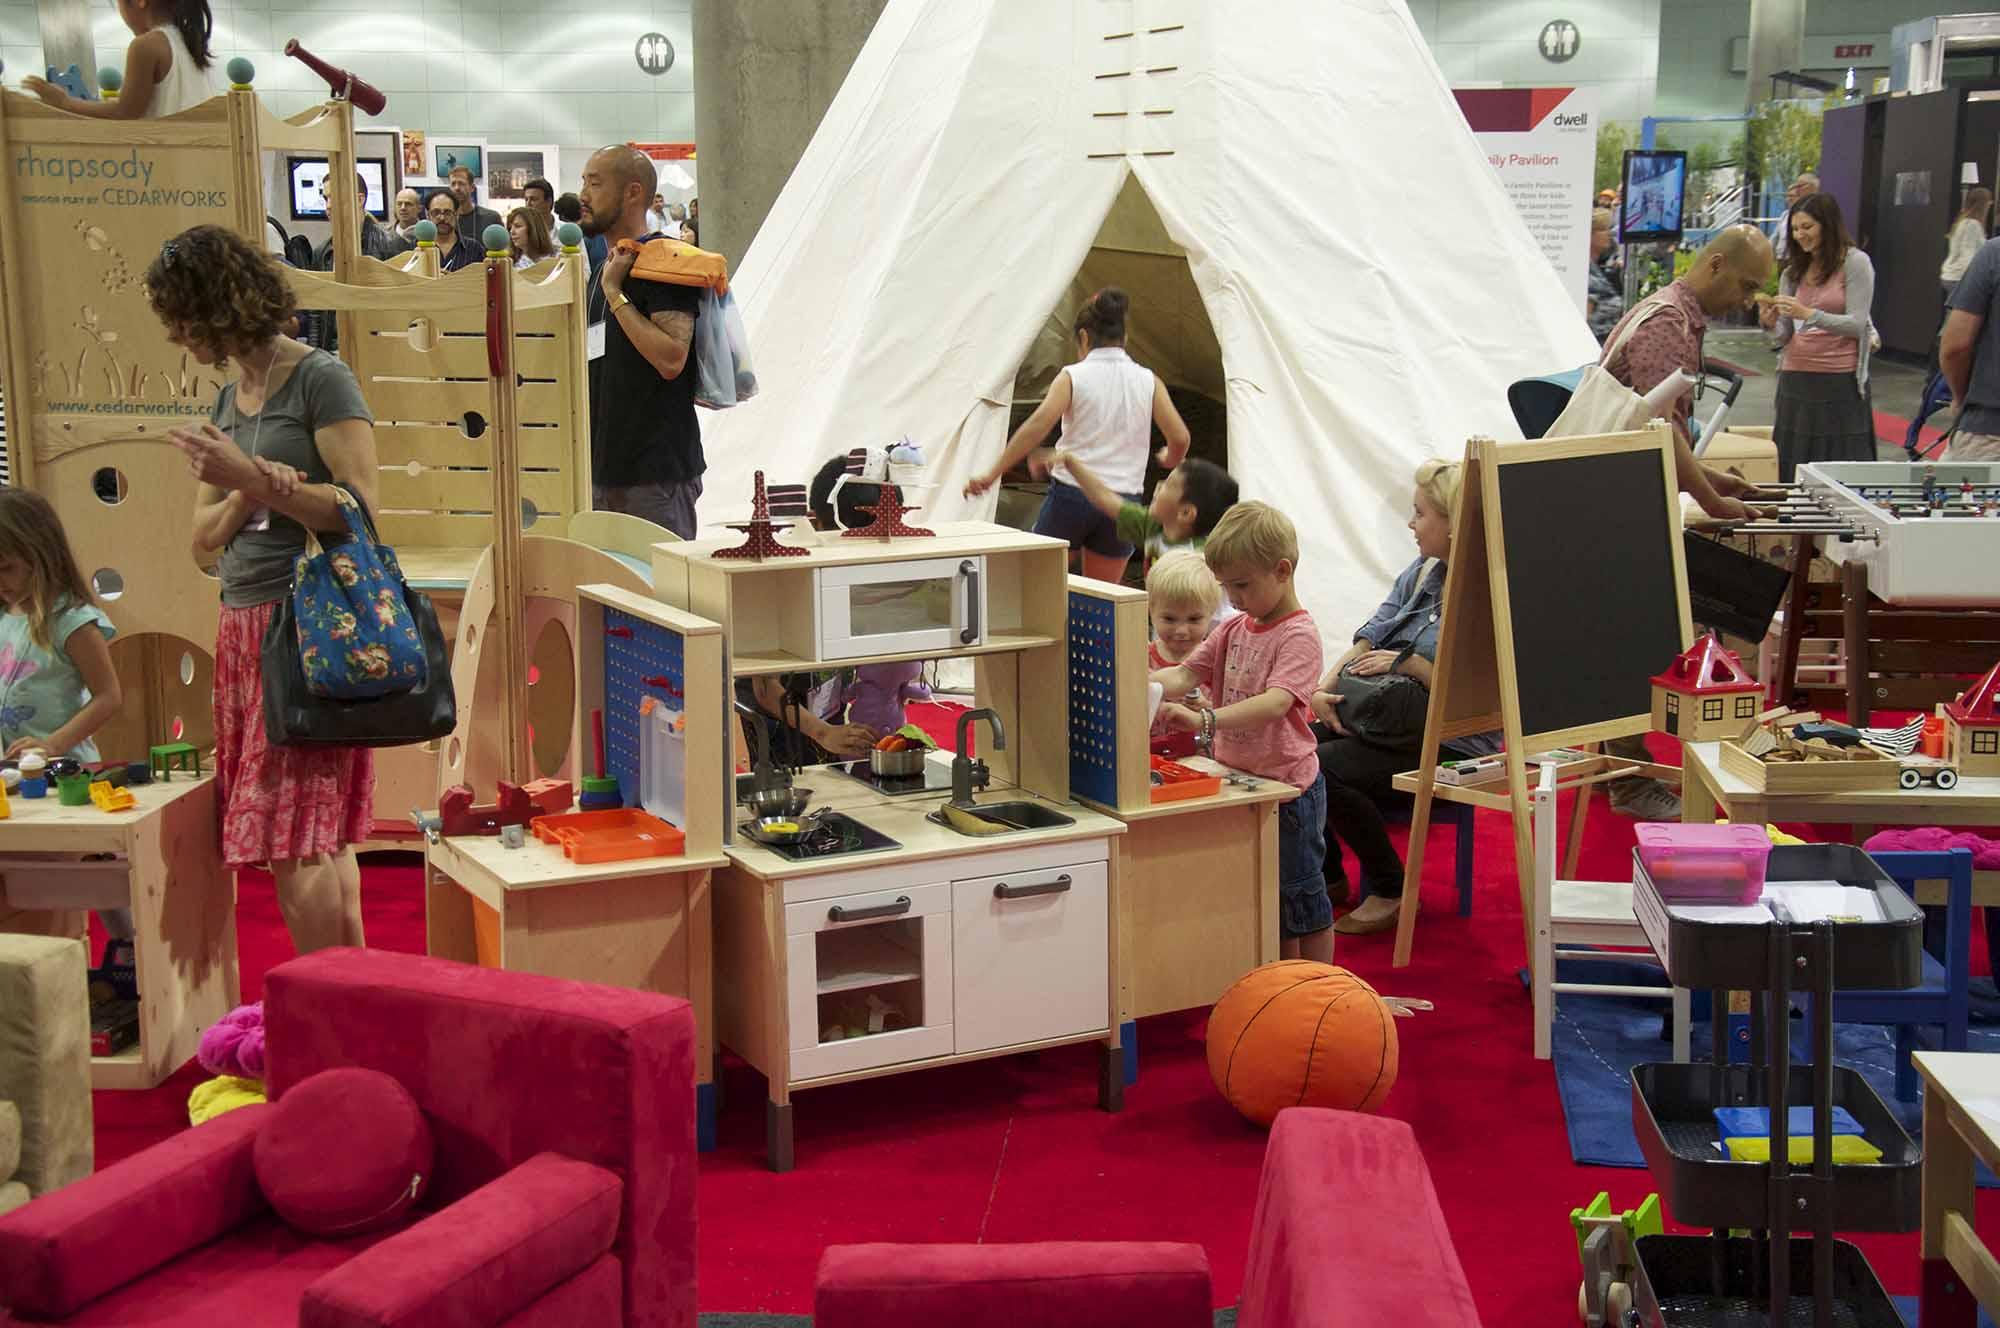 Dwell on Design Modern Family Pavilion